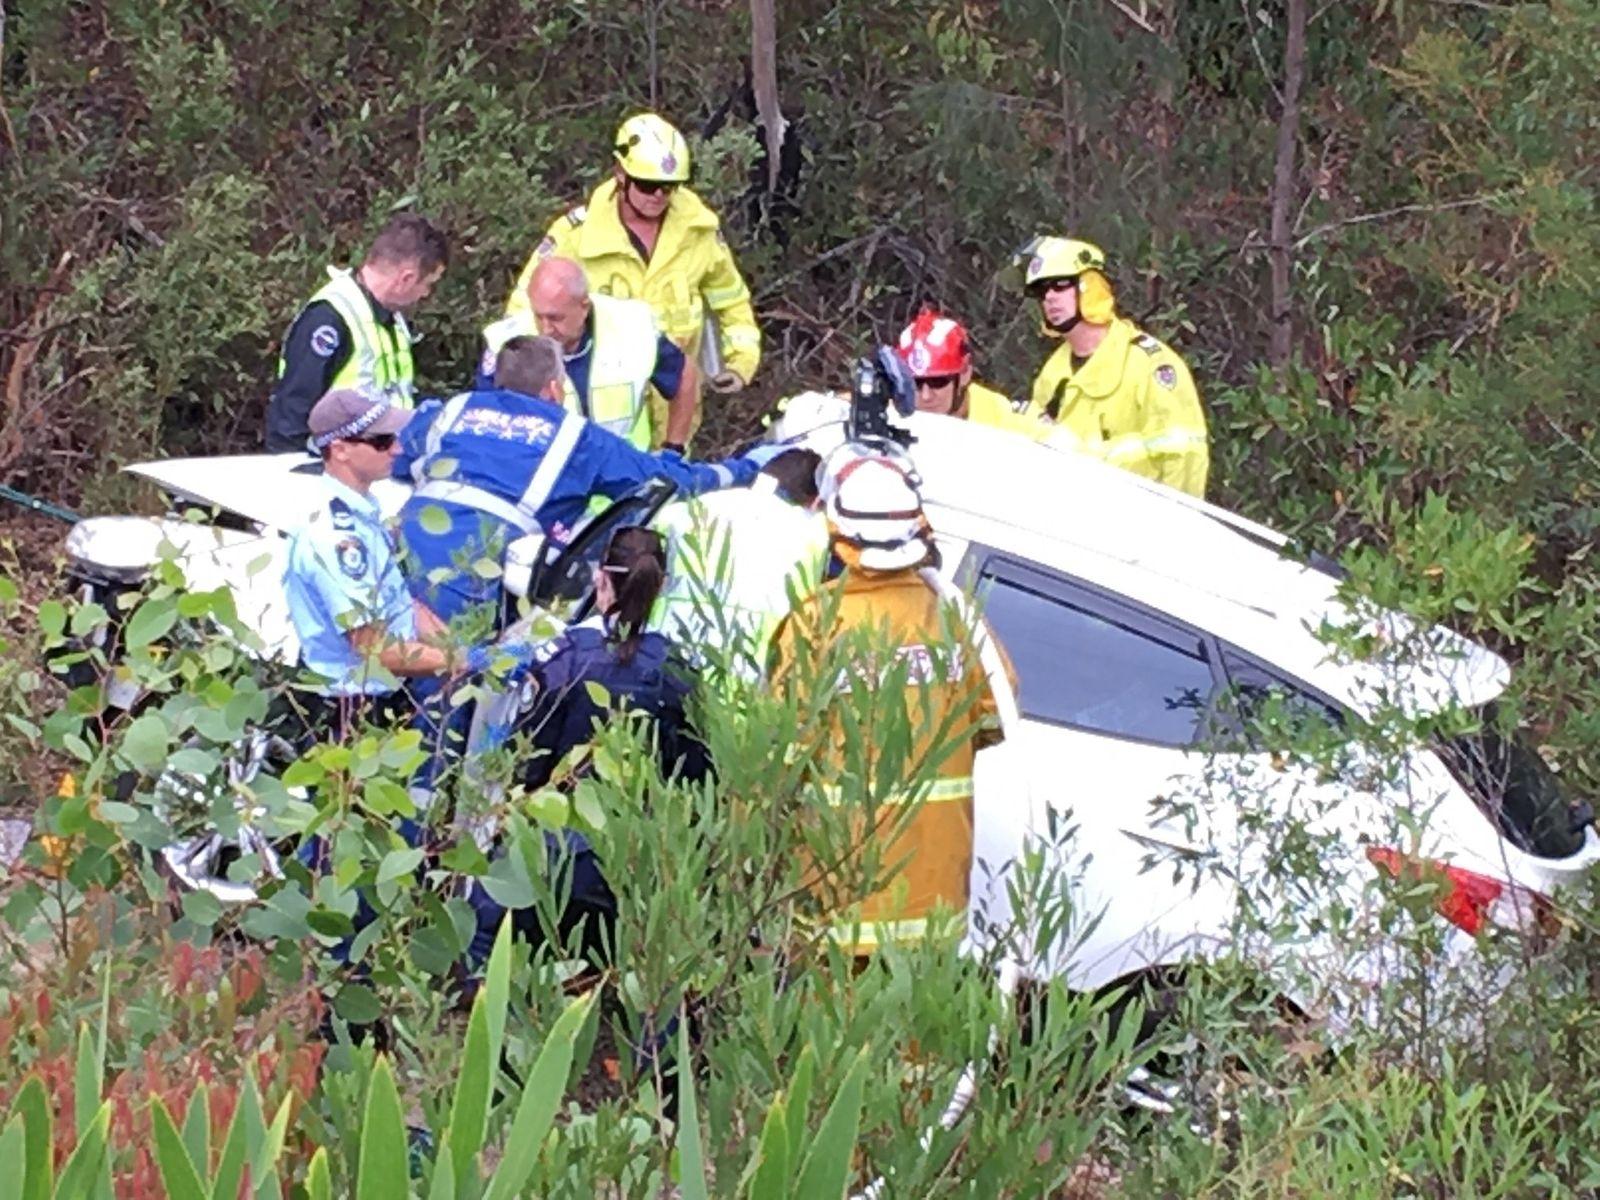 Australia Helicopter Rescue